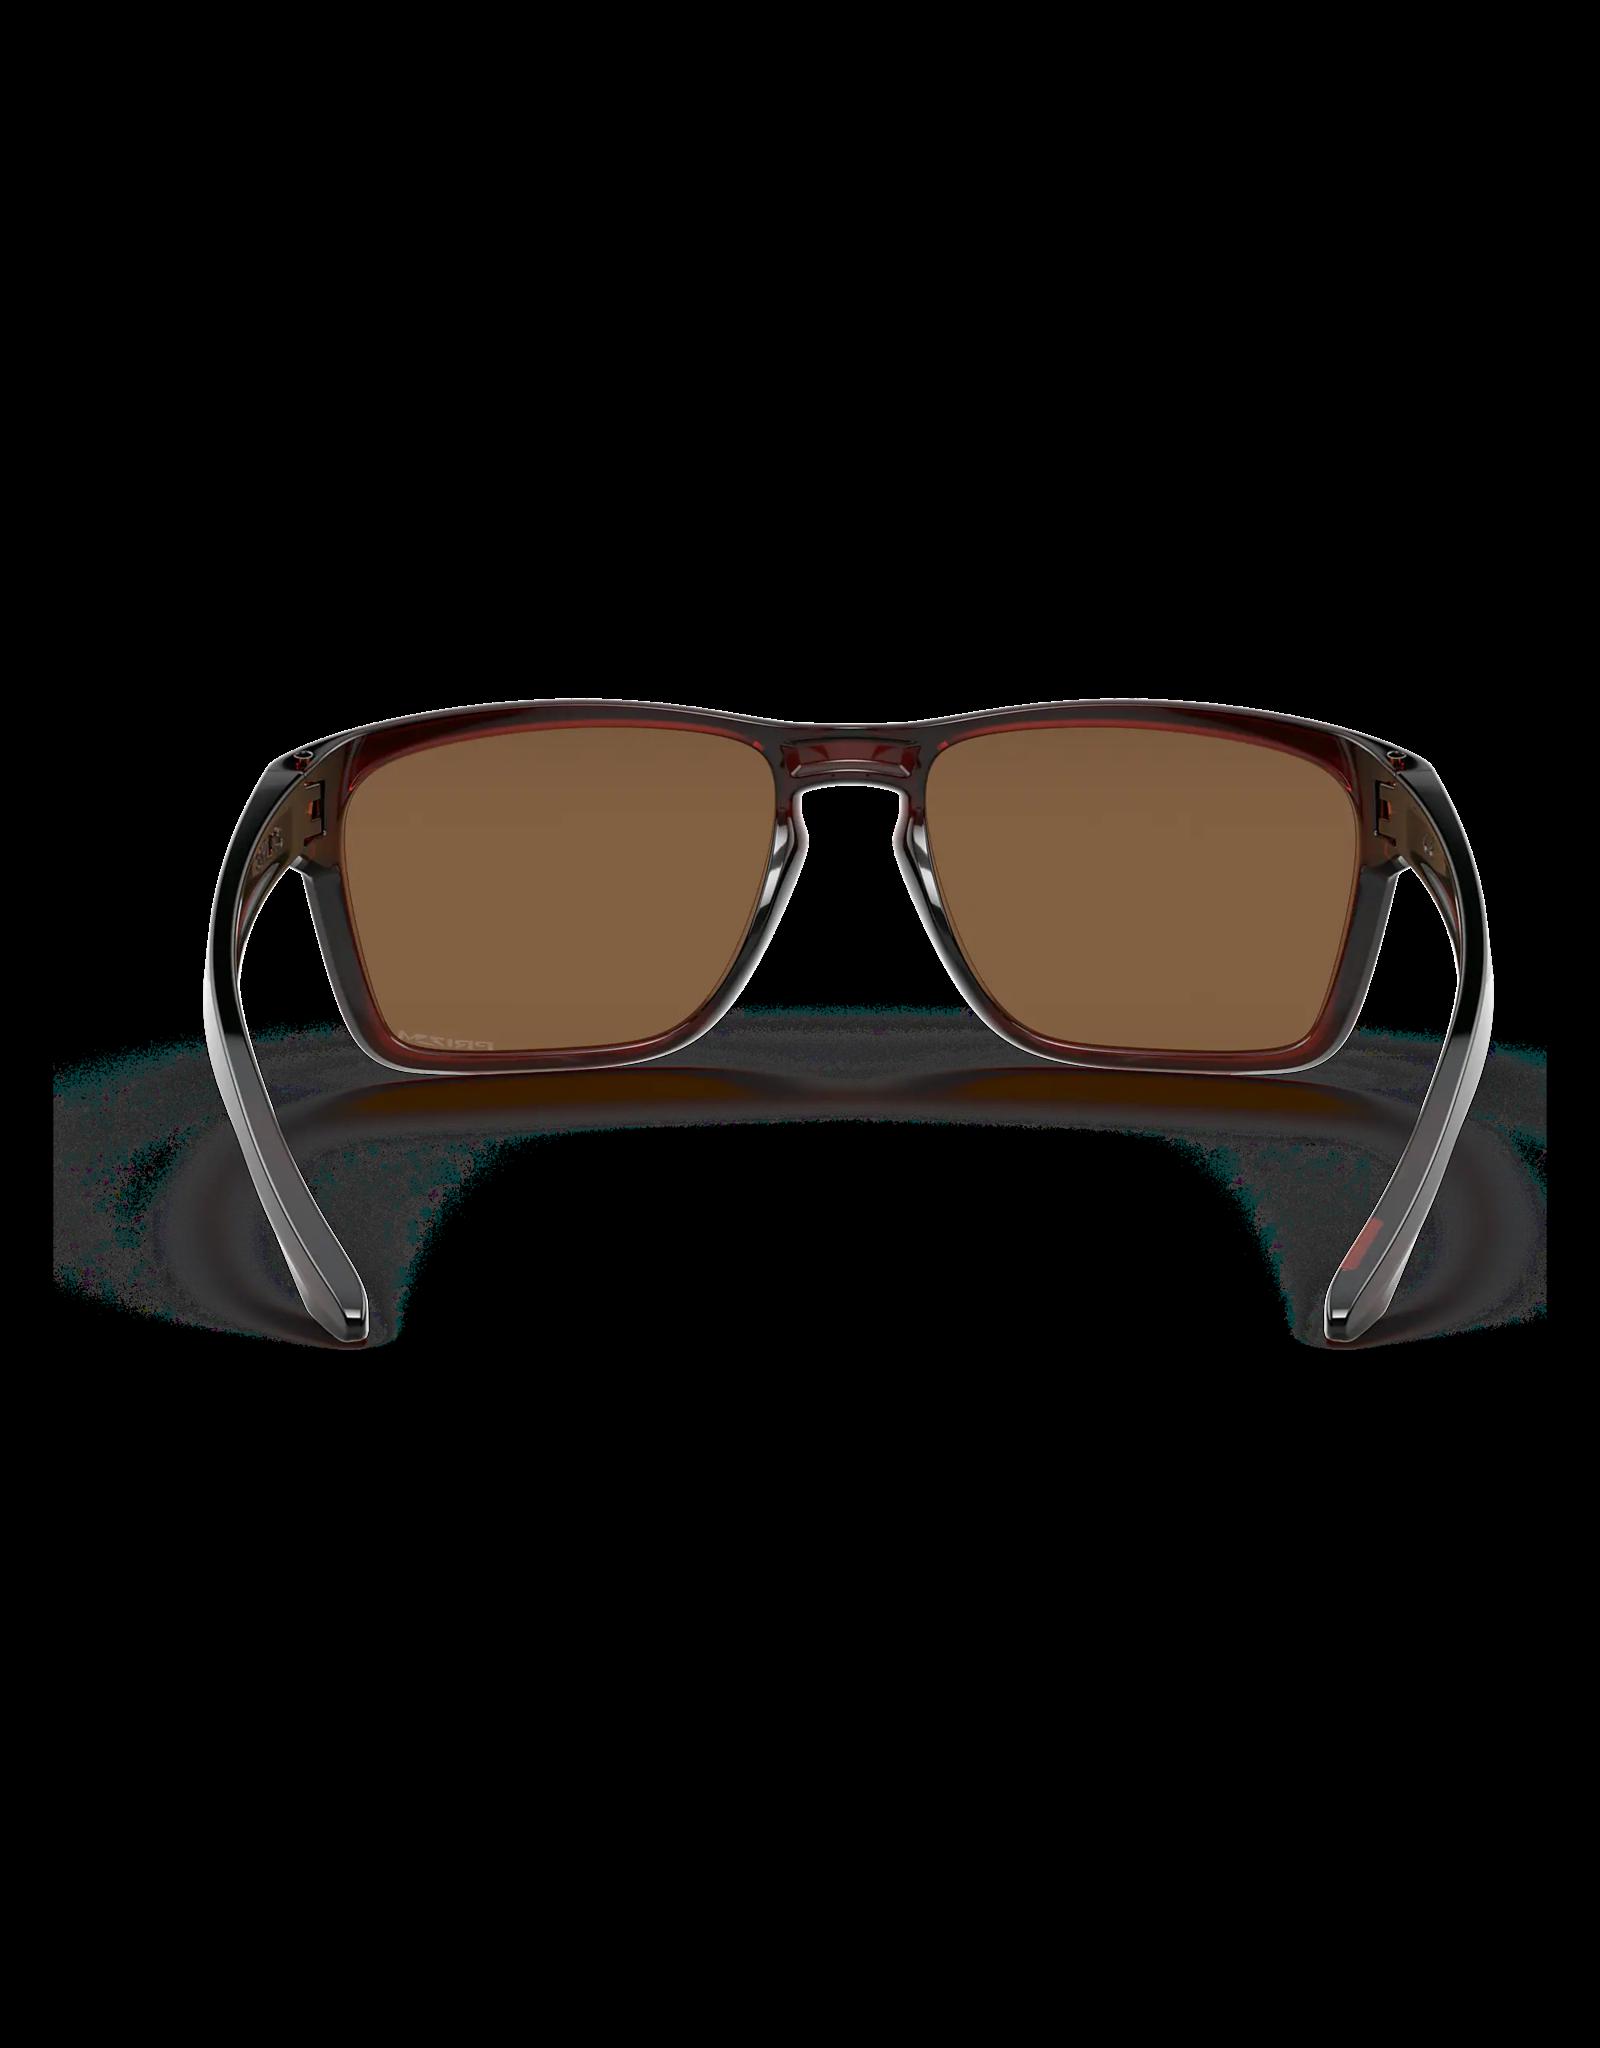 OAKLEY Oakley Sylas polished Rootbeer prizm bronze sunglasses